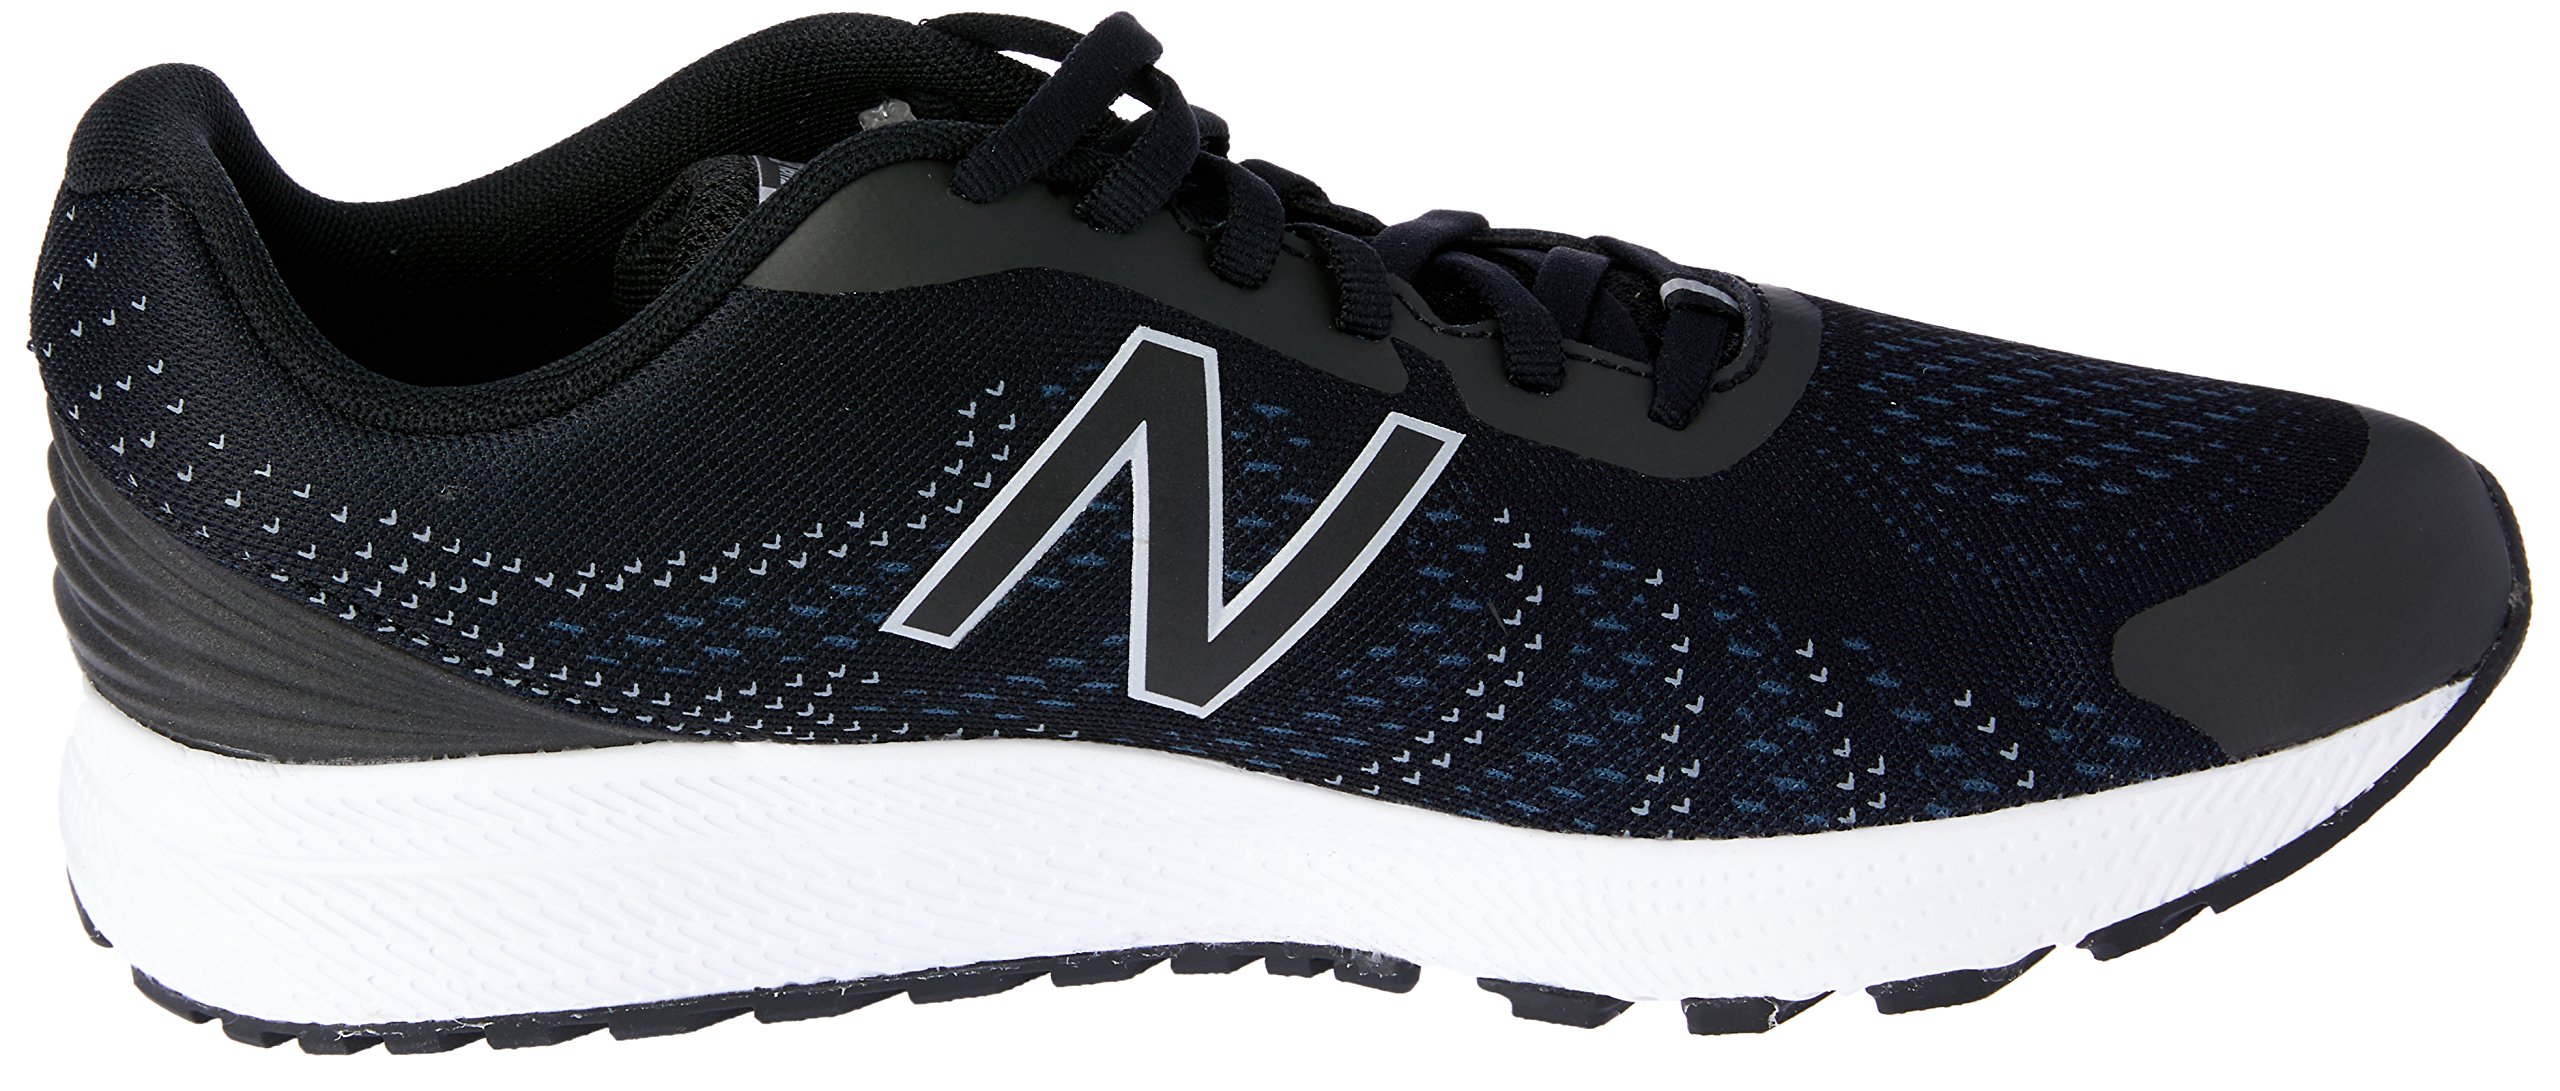 9d2fef595a81 New Balance Kids  Rush V3 Road-Running-Shoes